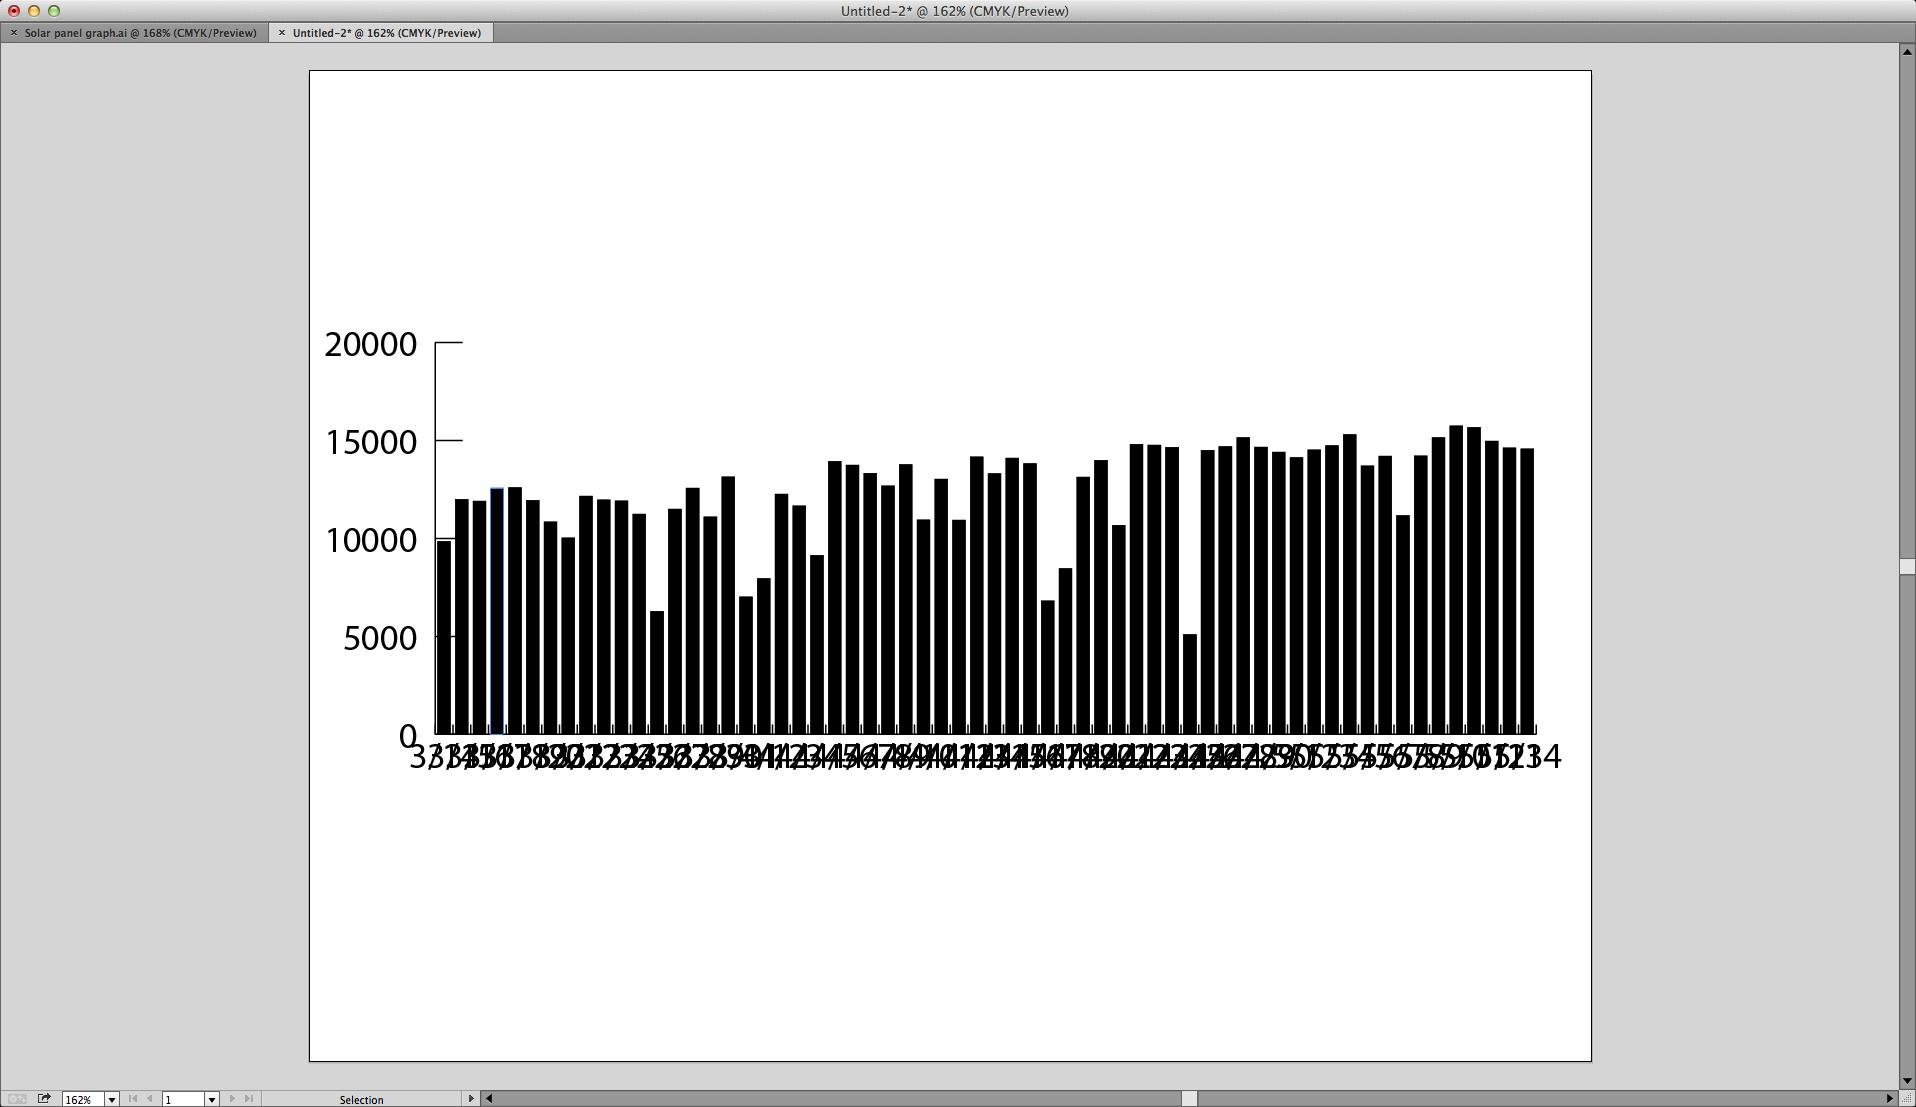 Adobe illustrator graph tool error bars with standard